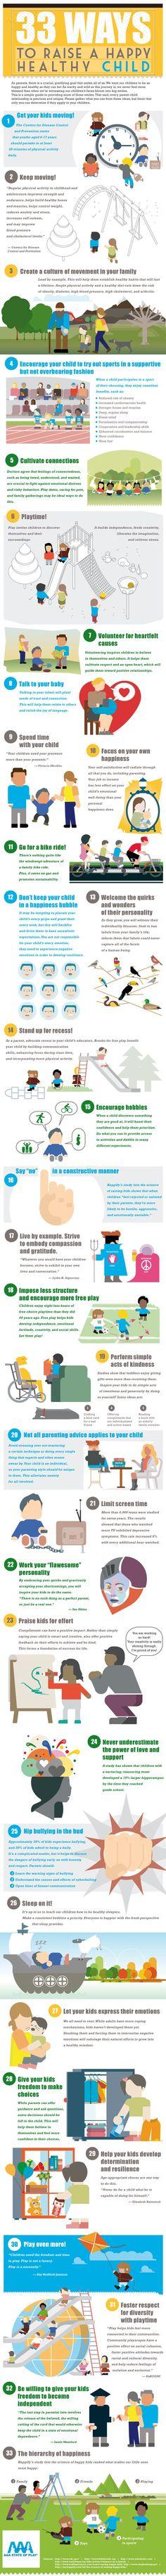 33 Ways to Raise a Happy Health Child - http://AAAStateofPlay.com - Infographic